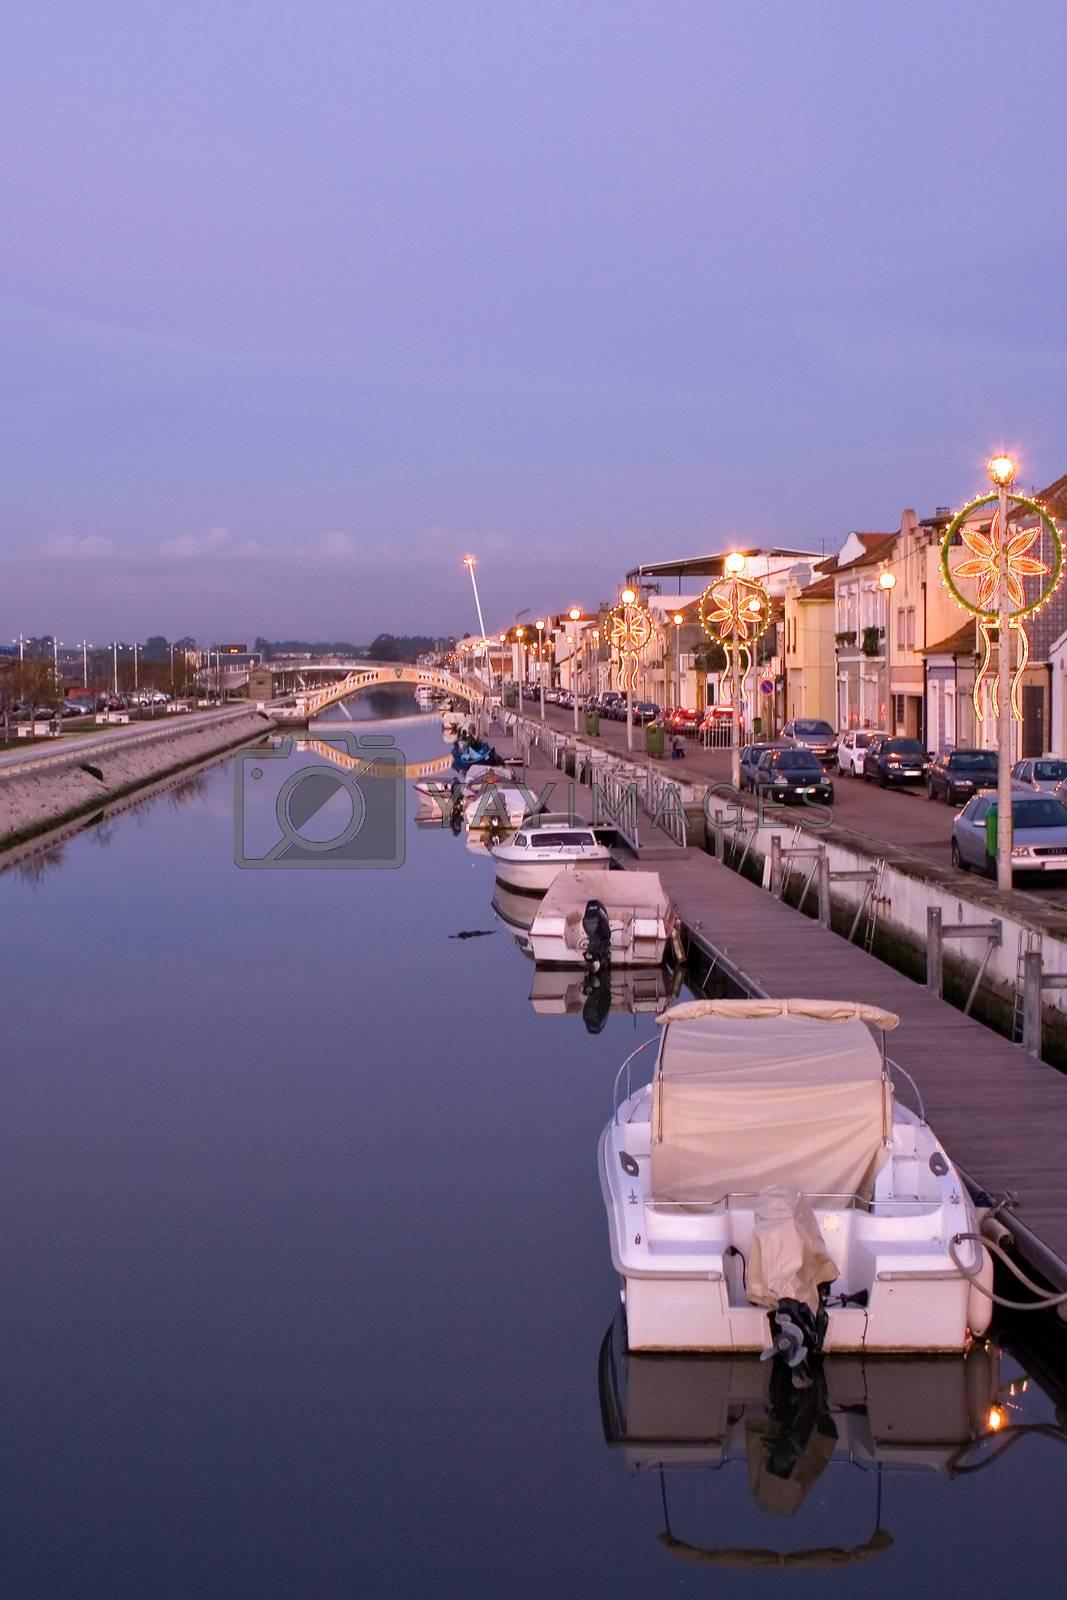 Aveiro canal by PauloResende